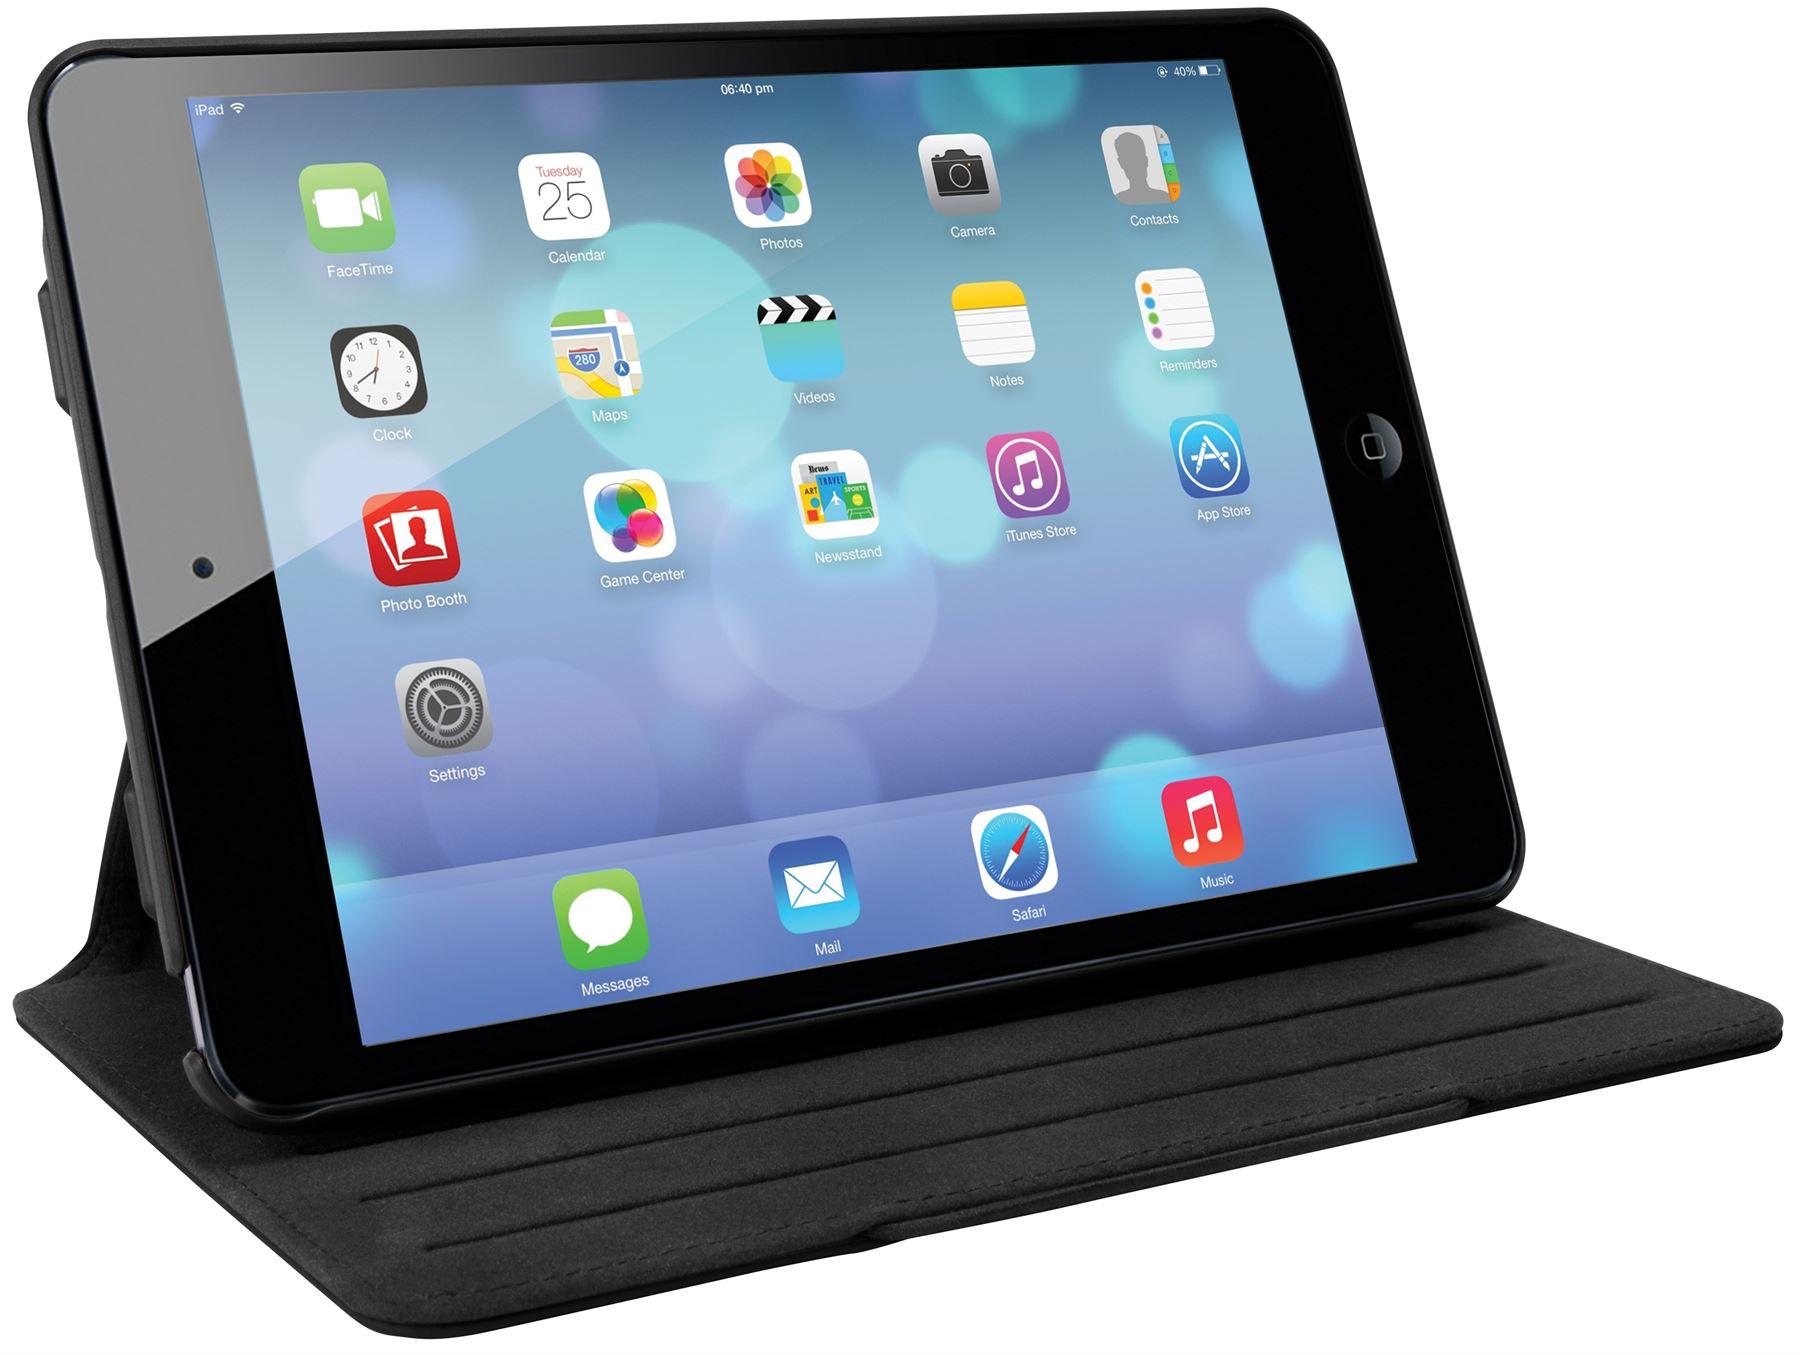 versavu slim 2 case for ipad mini 3 2 ipad mini thz36105us black tablet cases targus. Black Bedroom Furniture Sets. Home Design Ideas